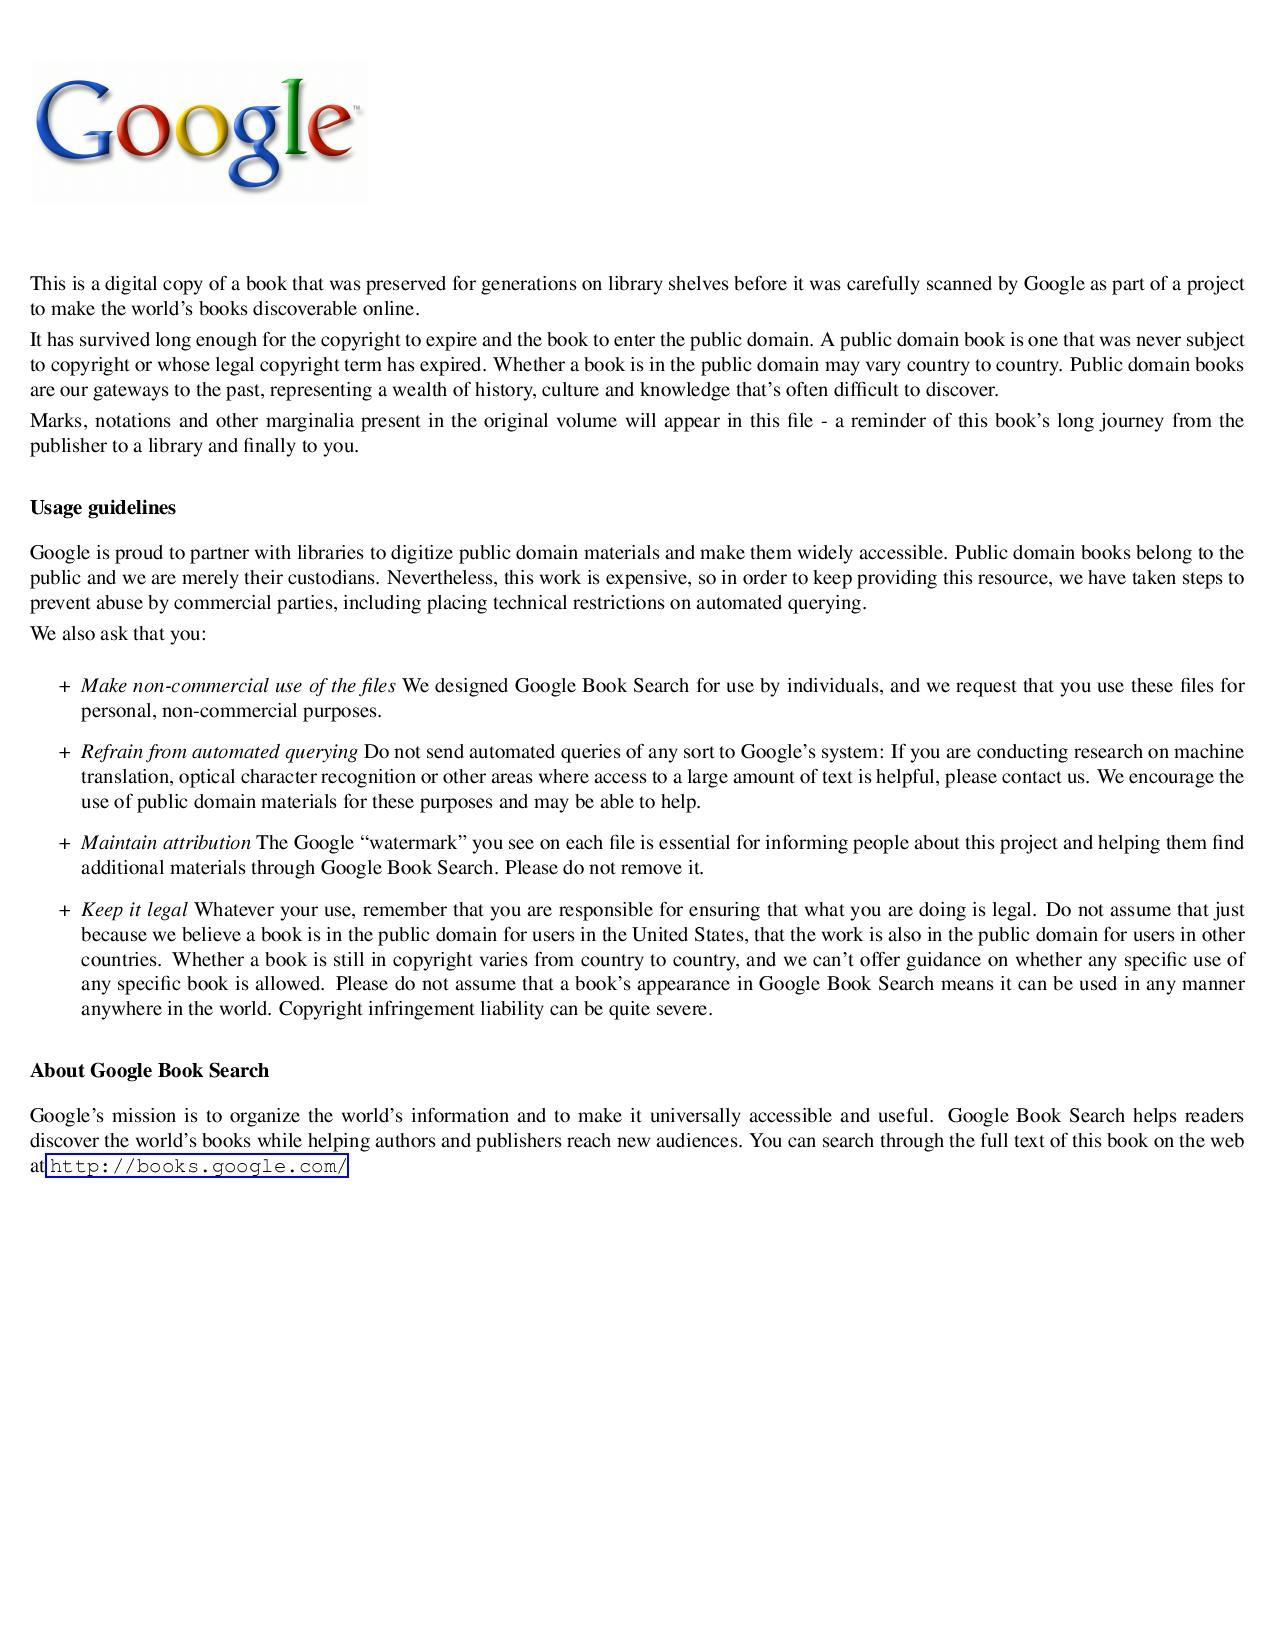 Fakty i mysli: evreiskiī vopros v Rossiī by I︠U︡liĭ Gessen